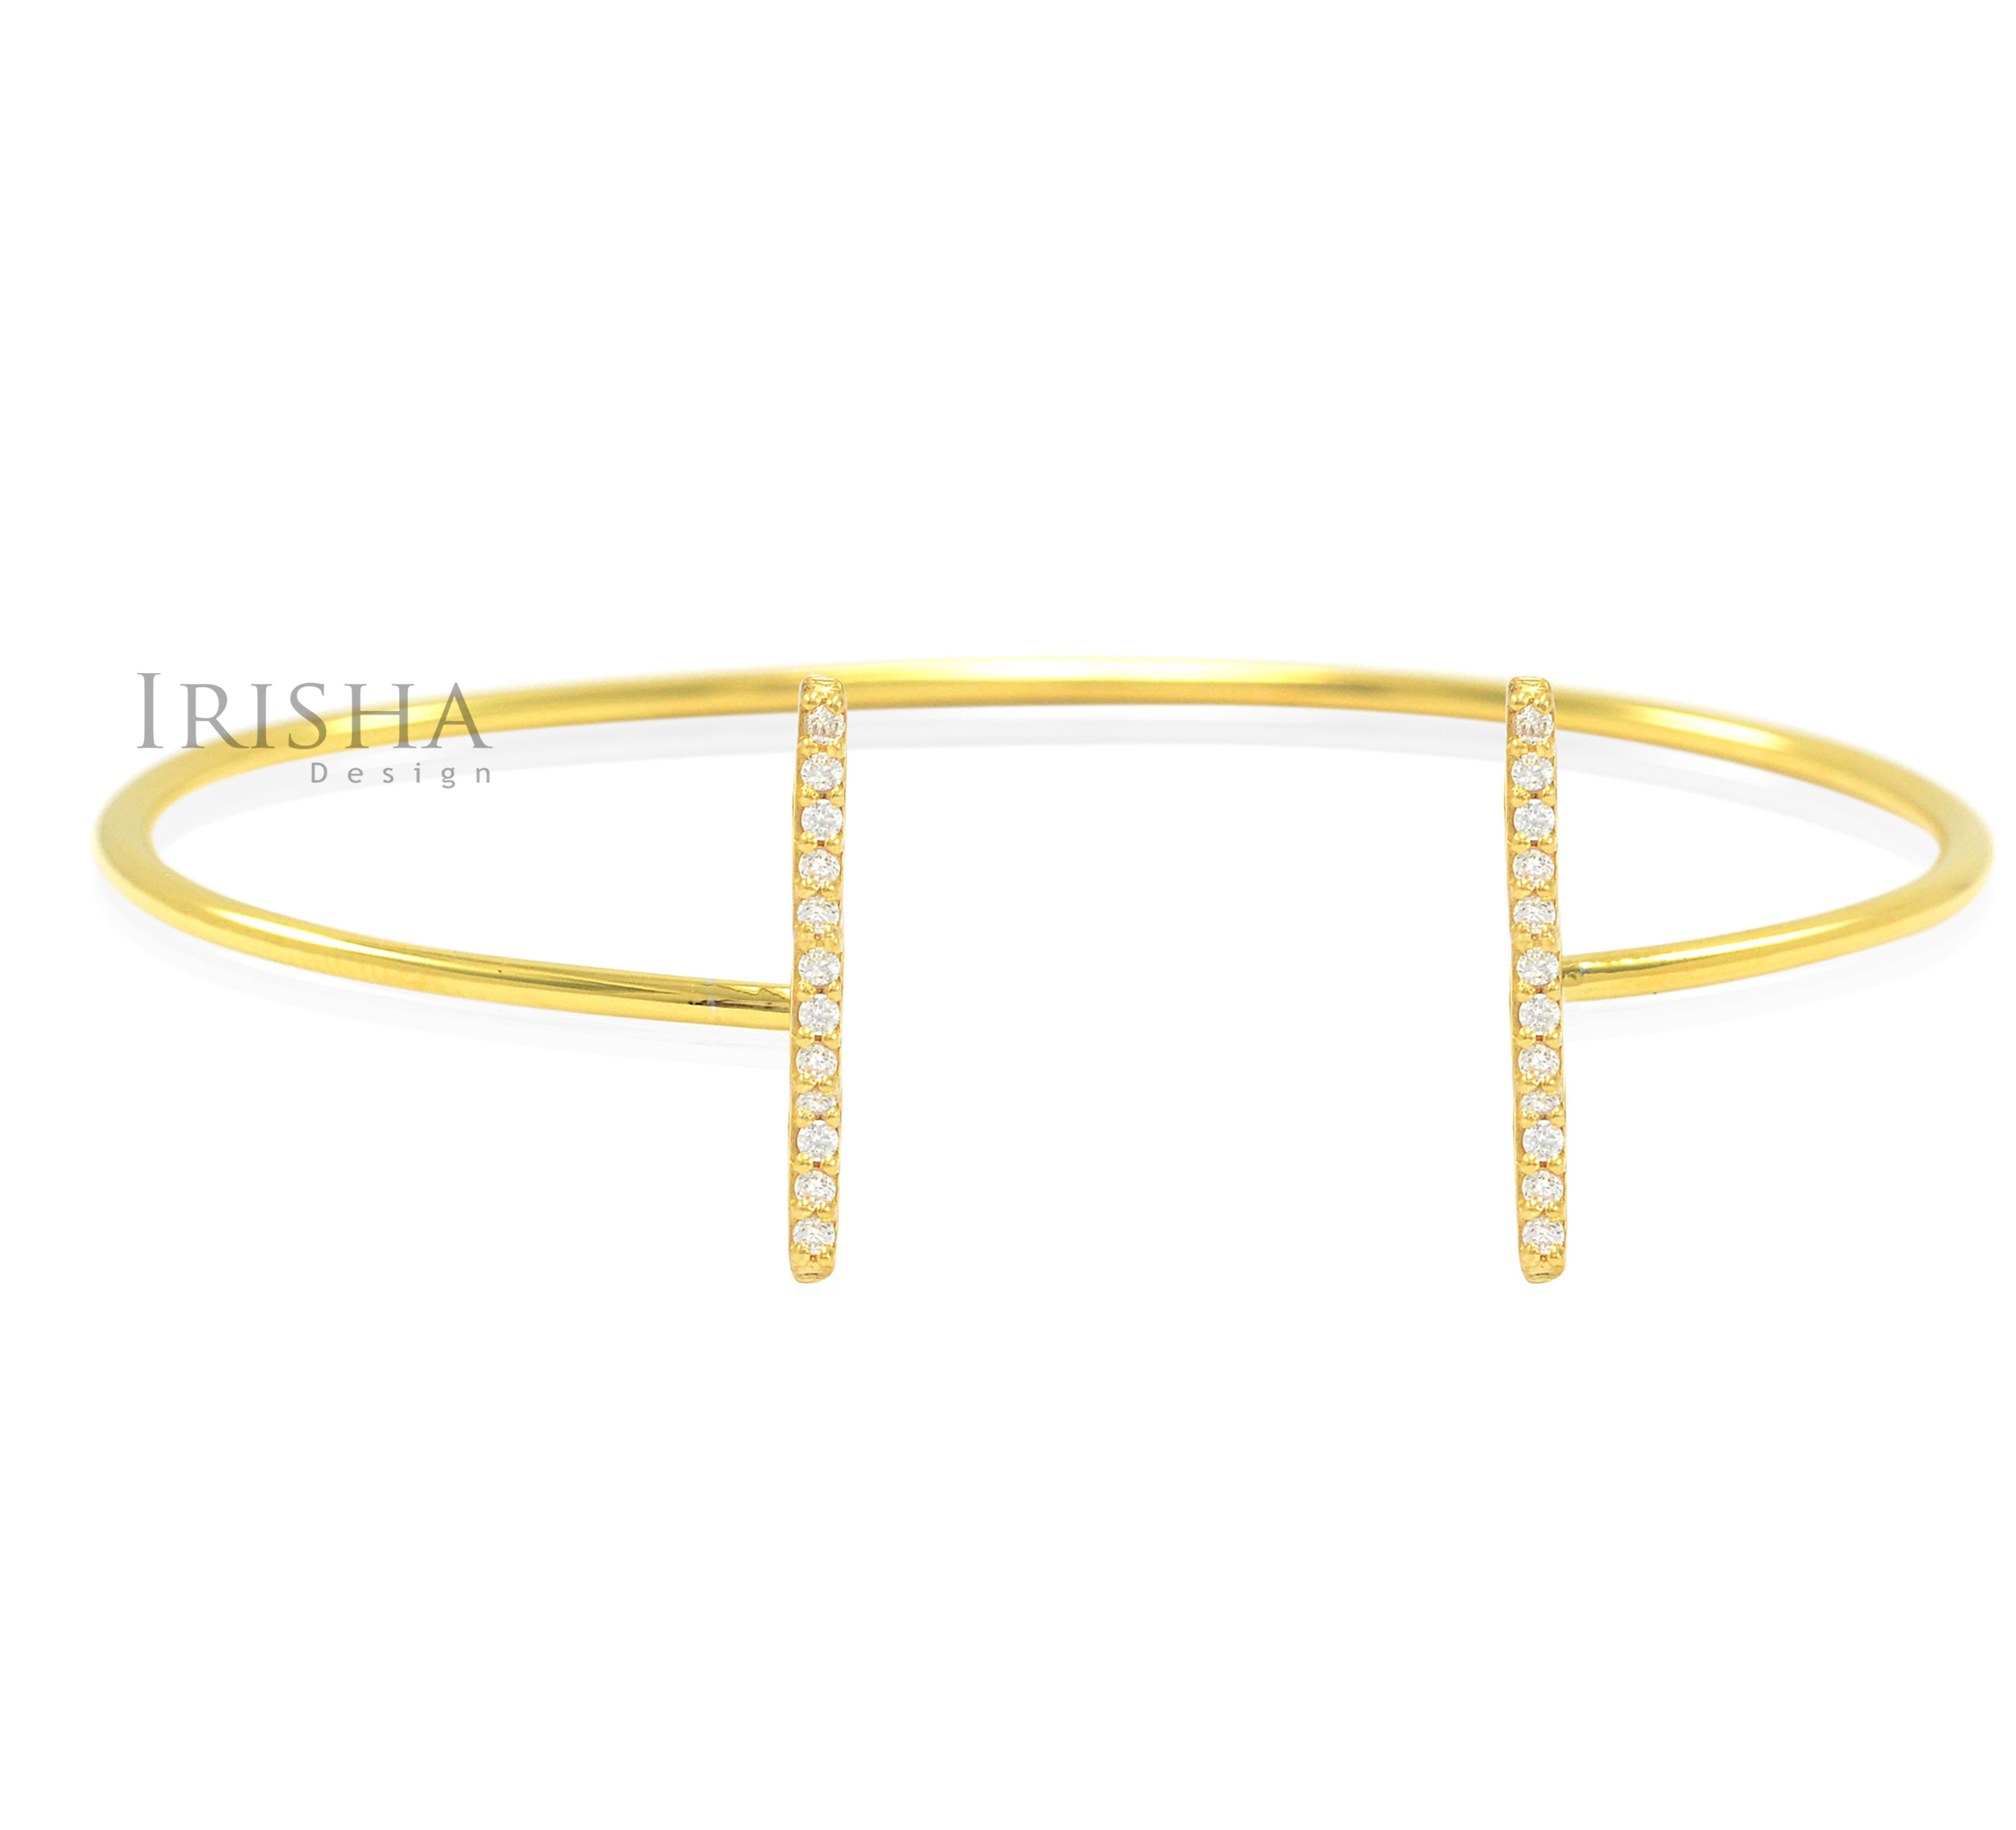 14K Gold 0.12 Ct. Genuine Diamond Open Bar Cuff Bangle Bracelet Fine Jewelry